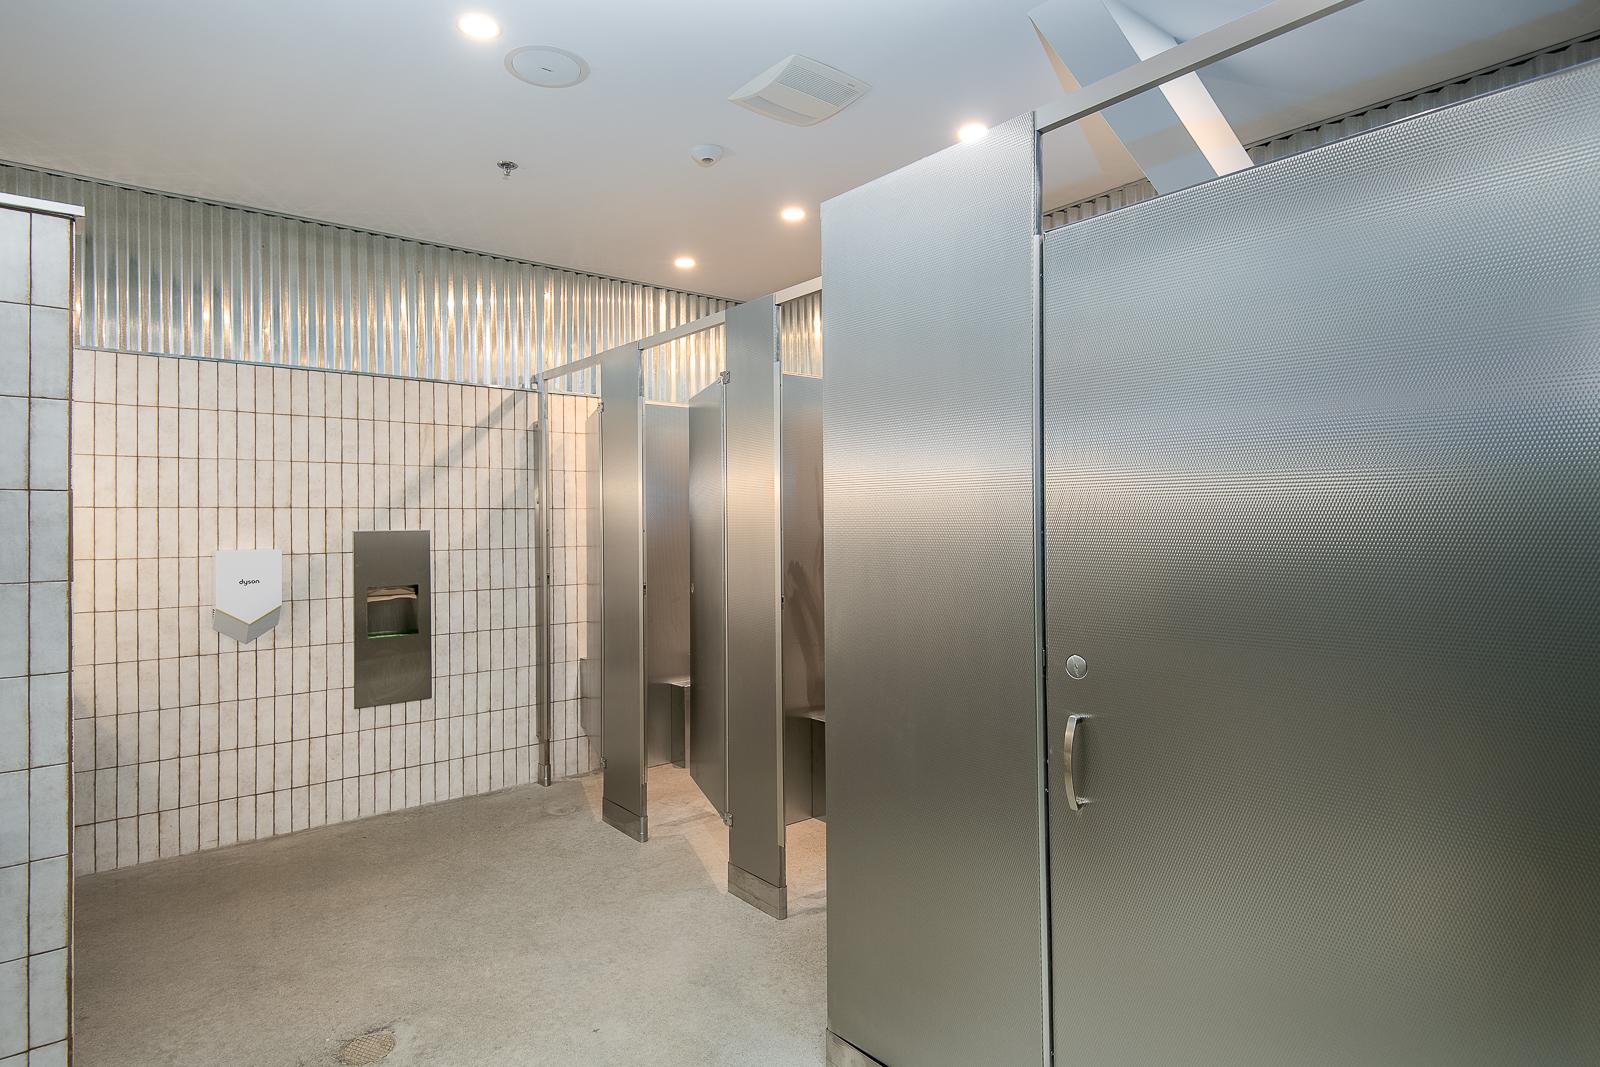 Newly remodeled bathroom.